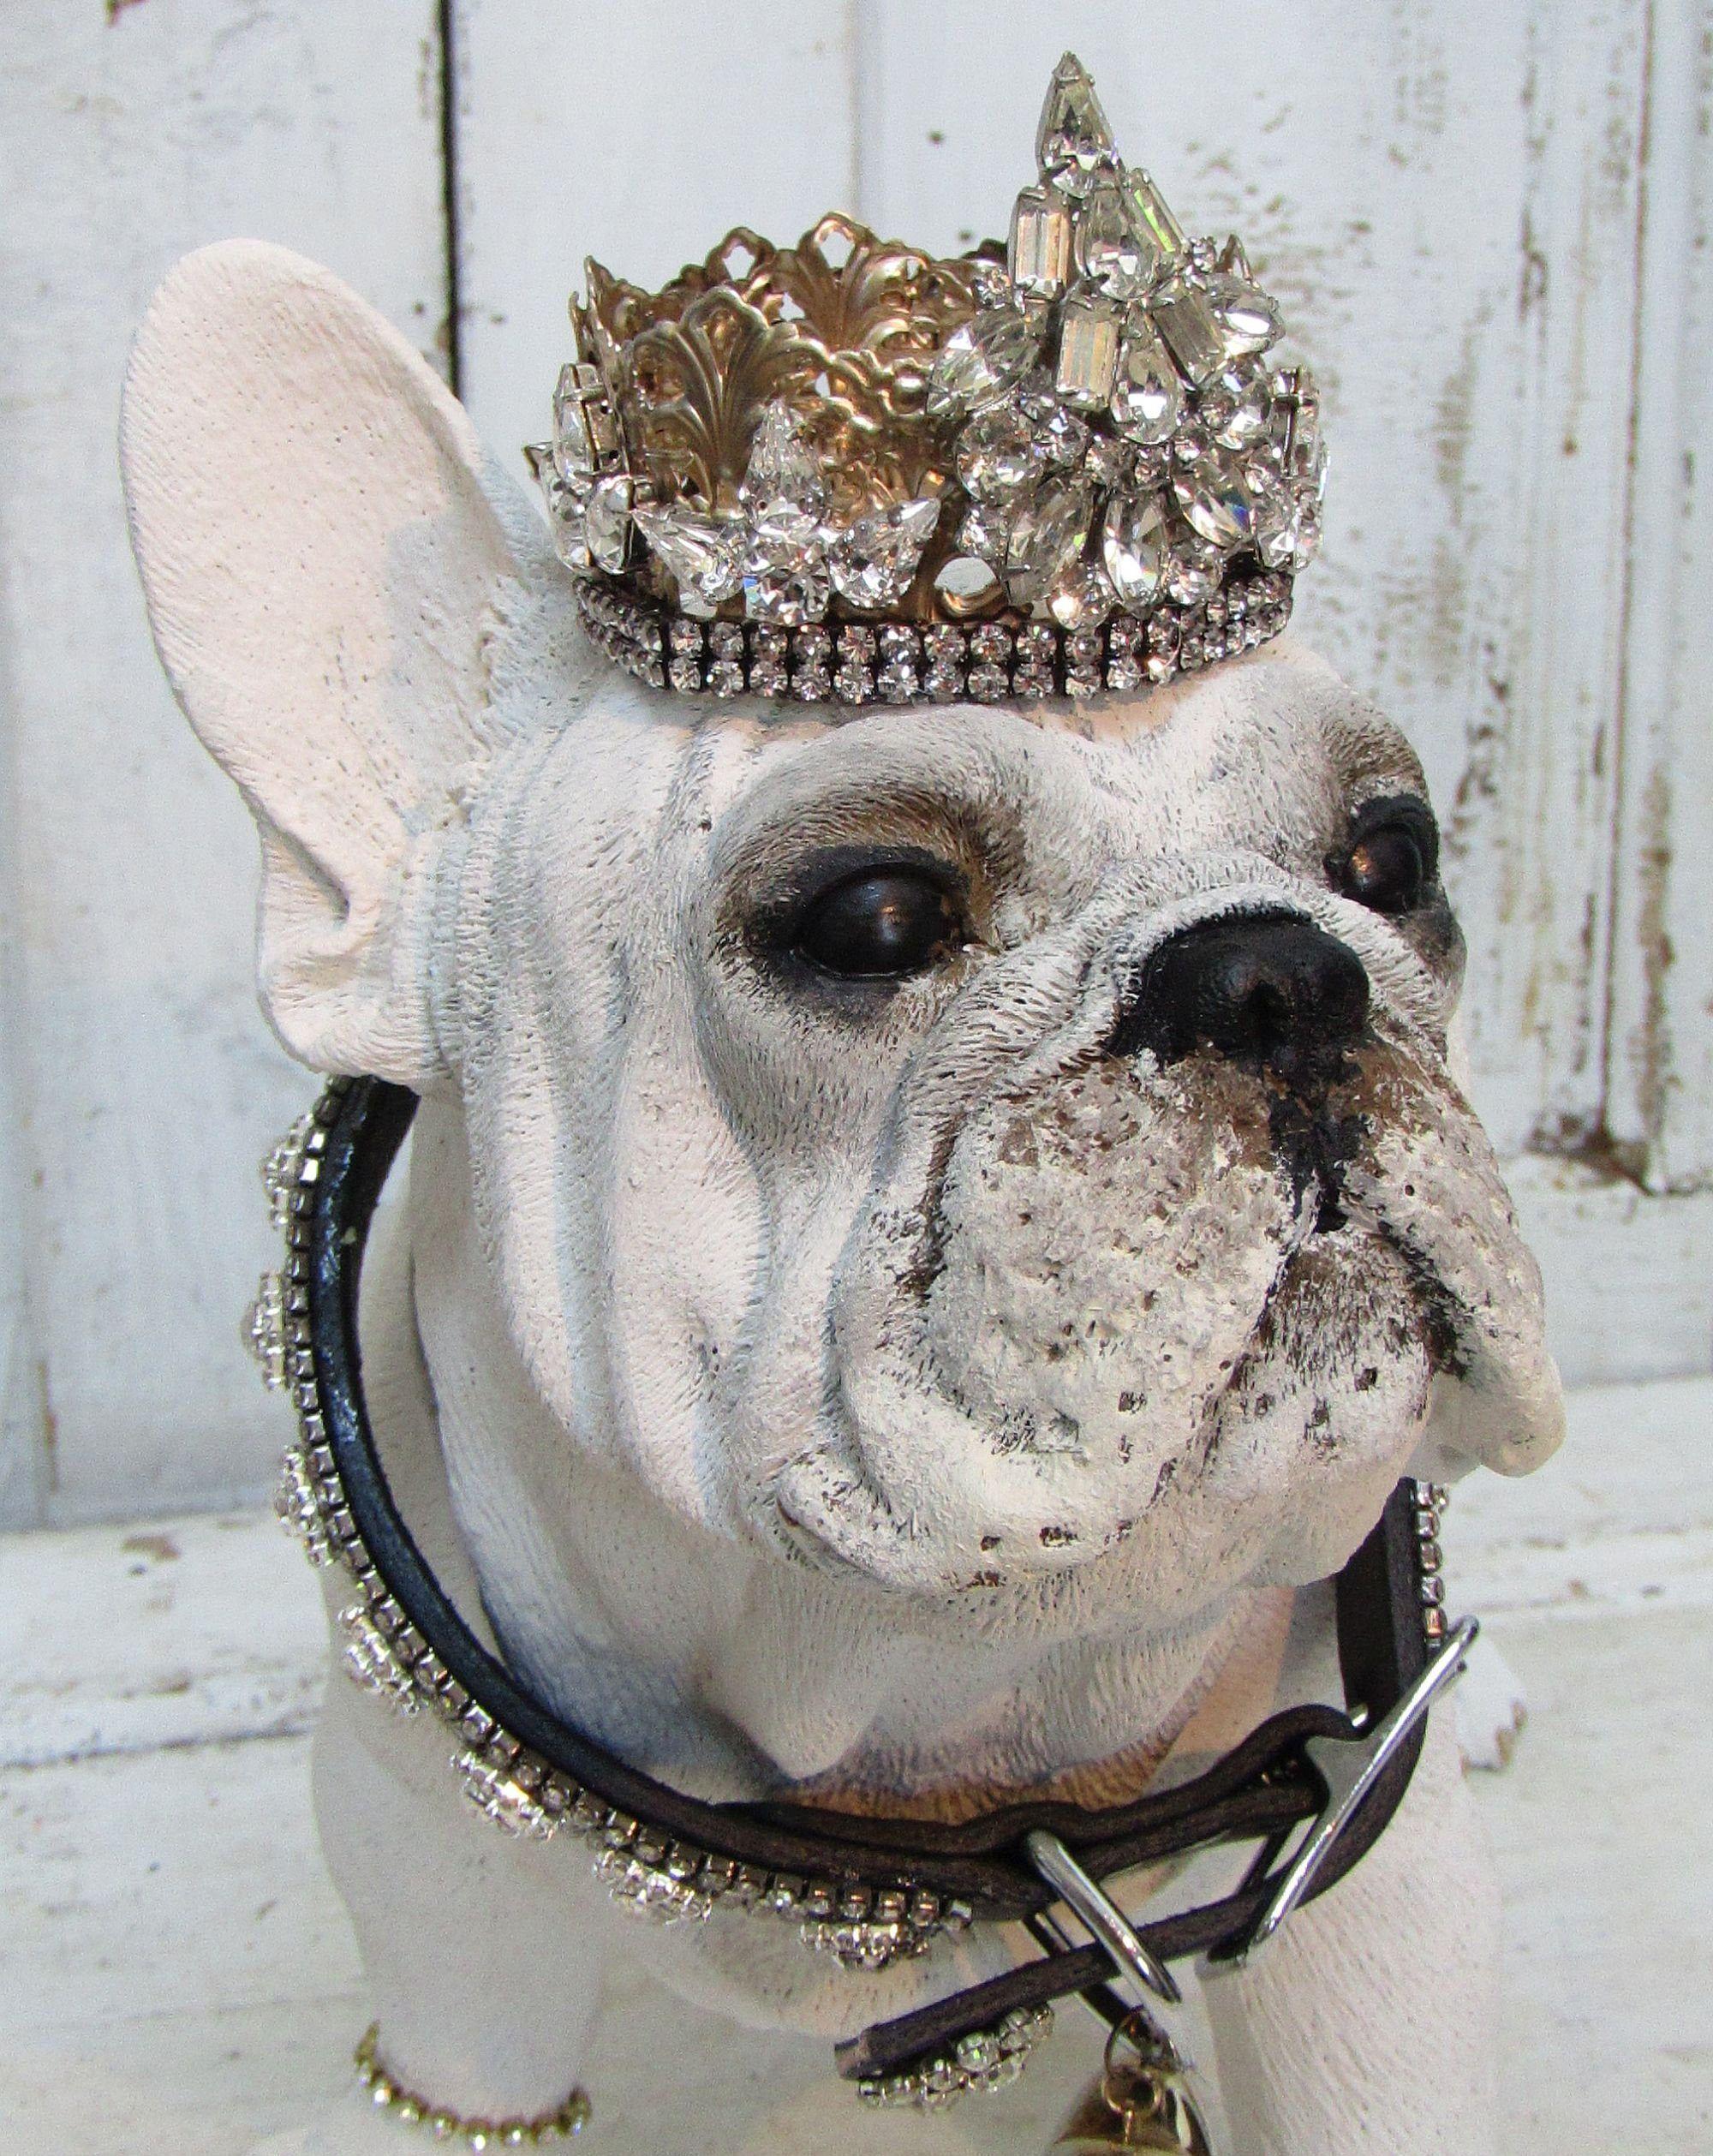 Albino French bulldog statue w/ handmade crown and